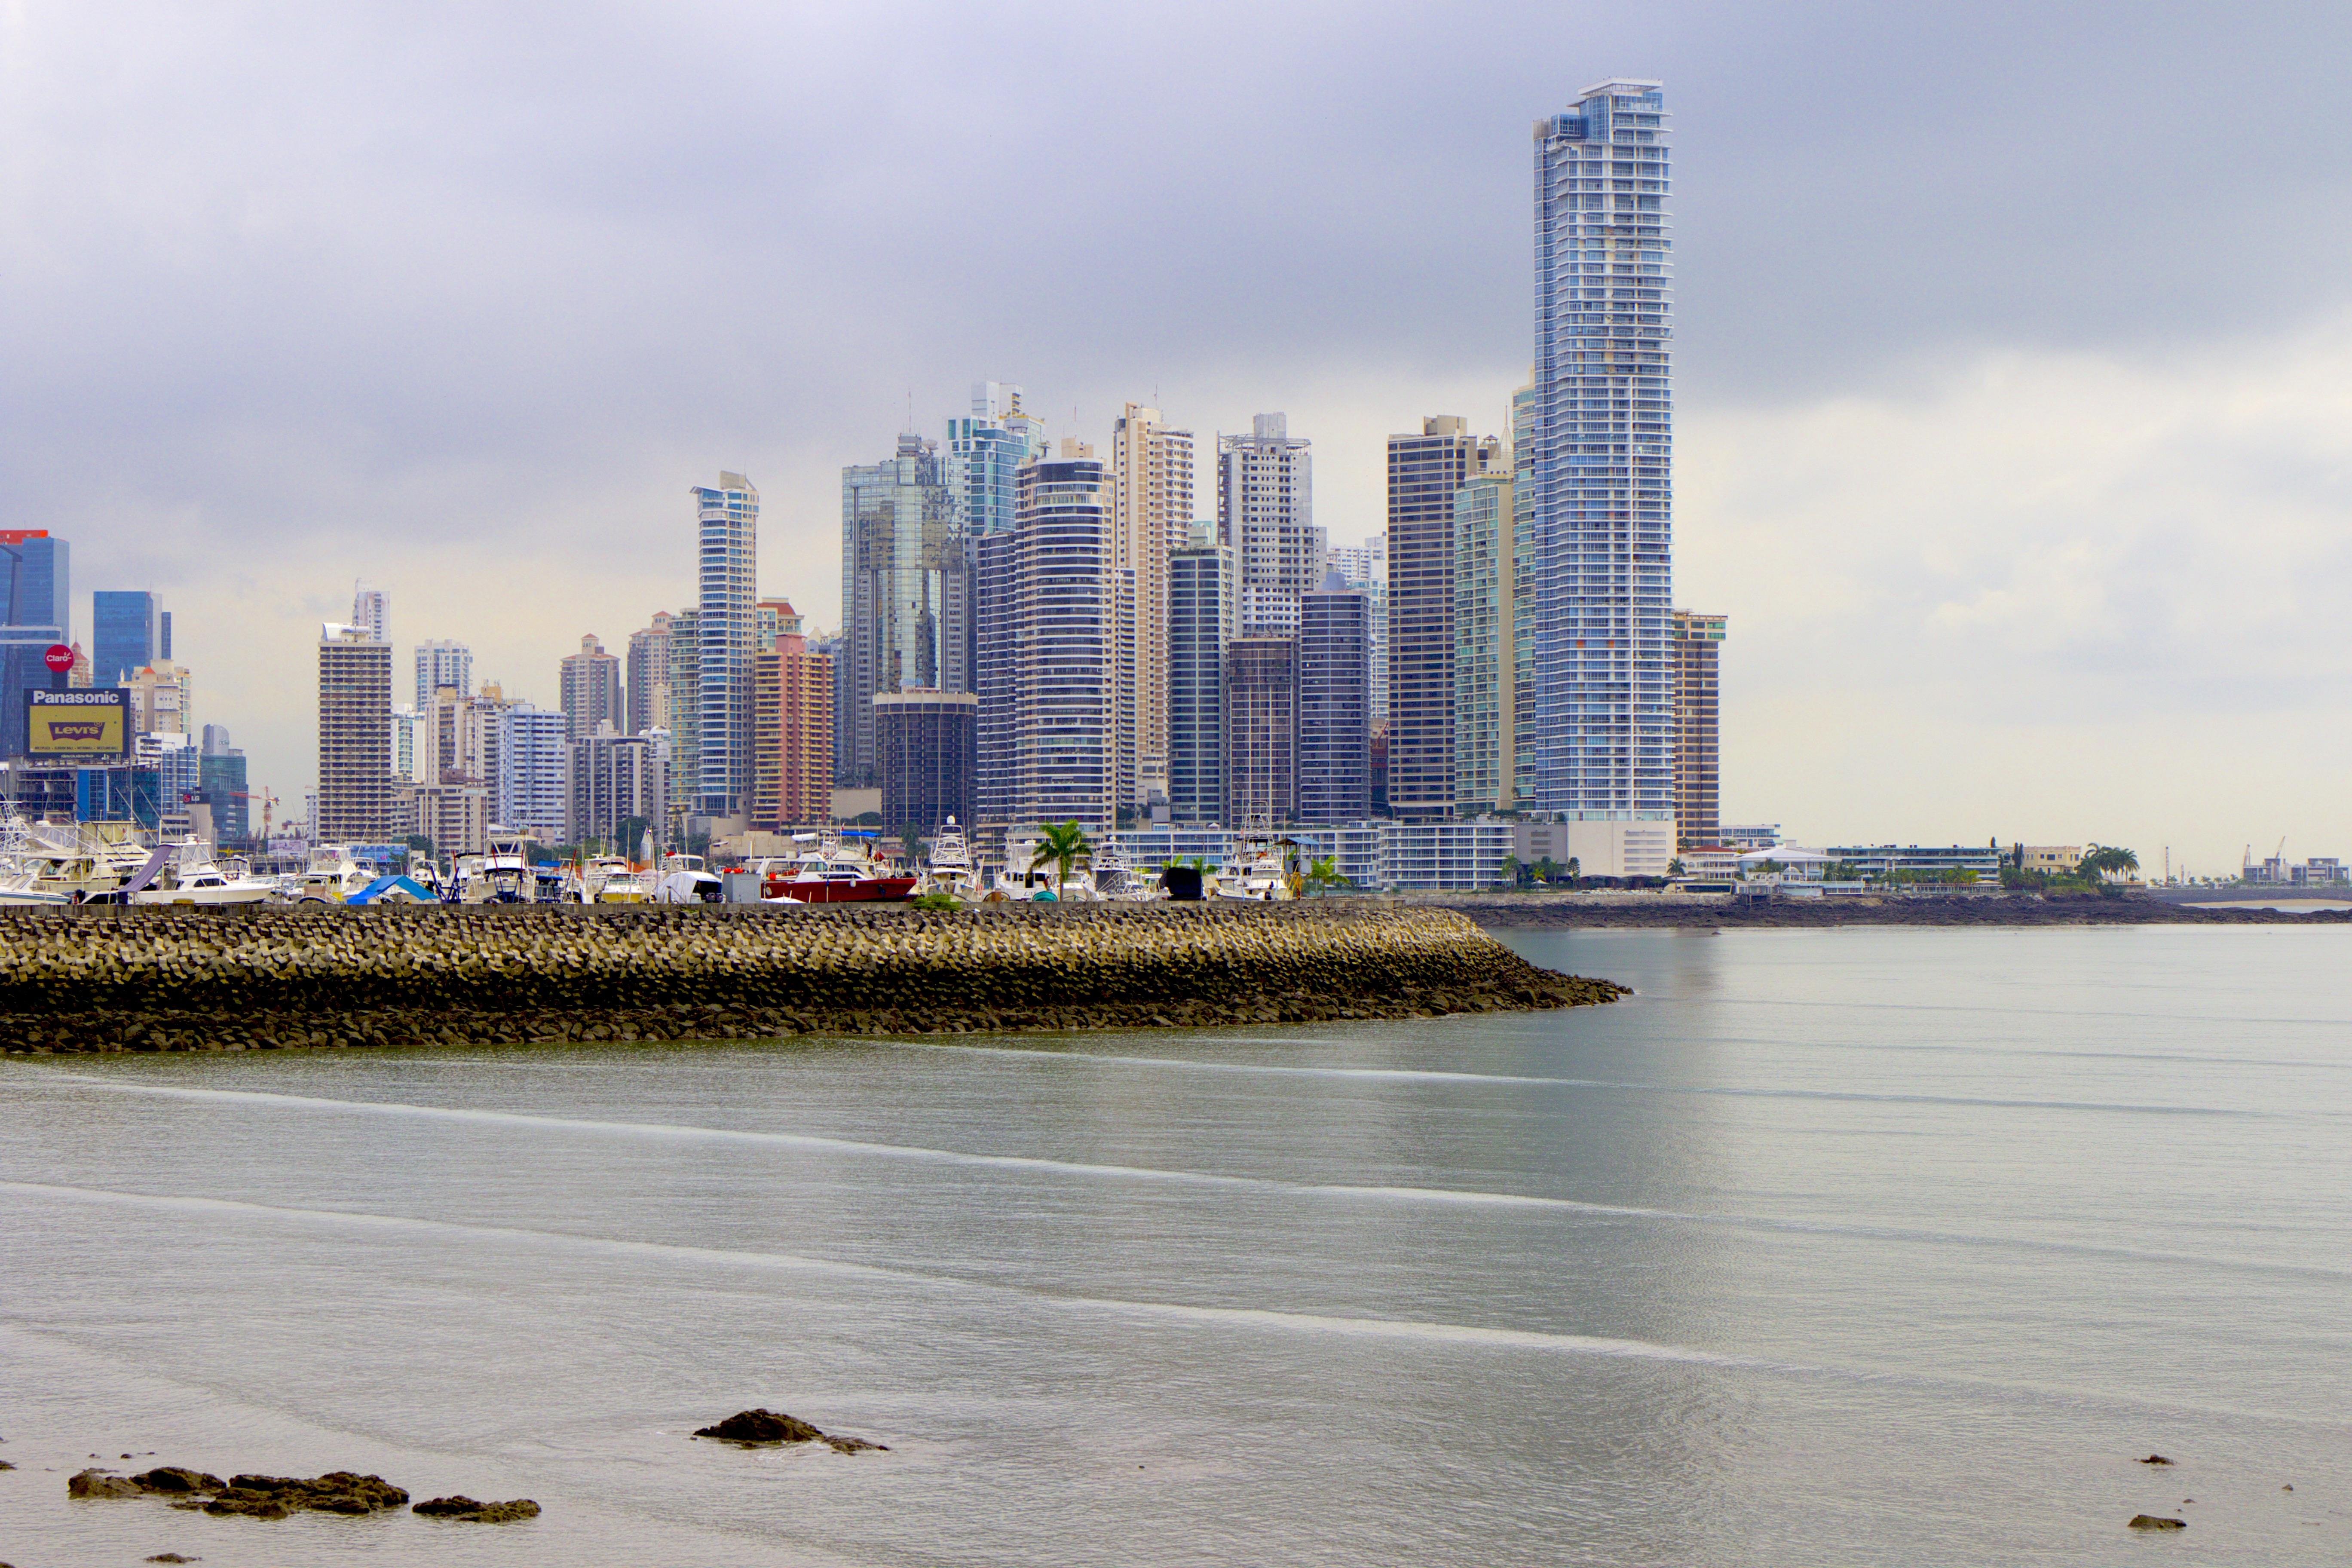 Panama city | cintura costera | Les aventures de floriane